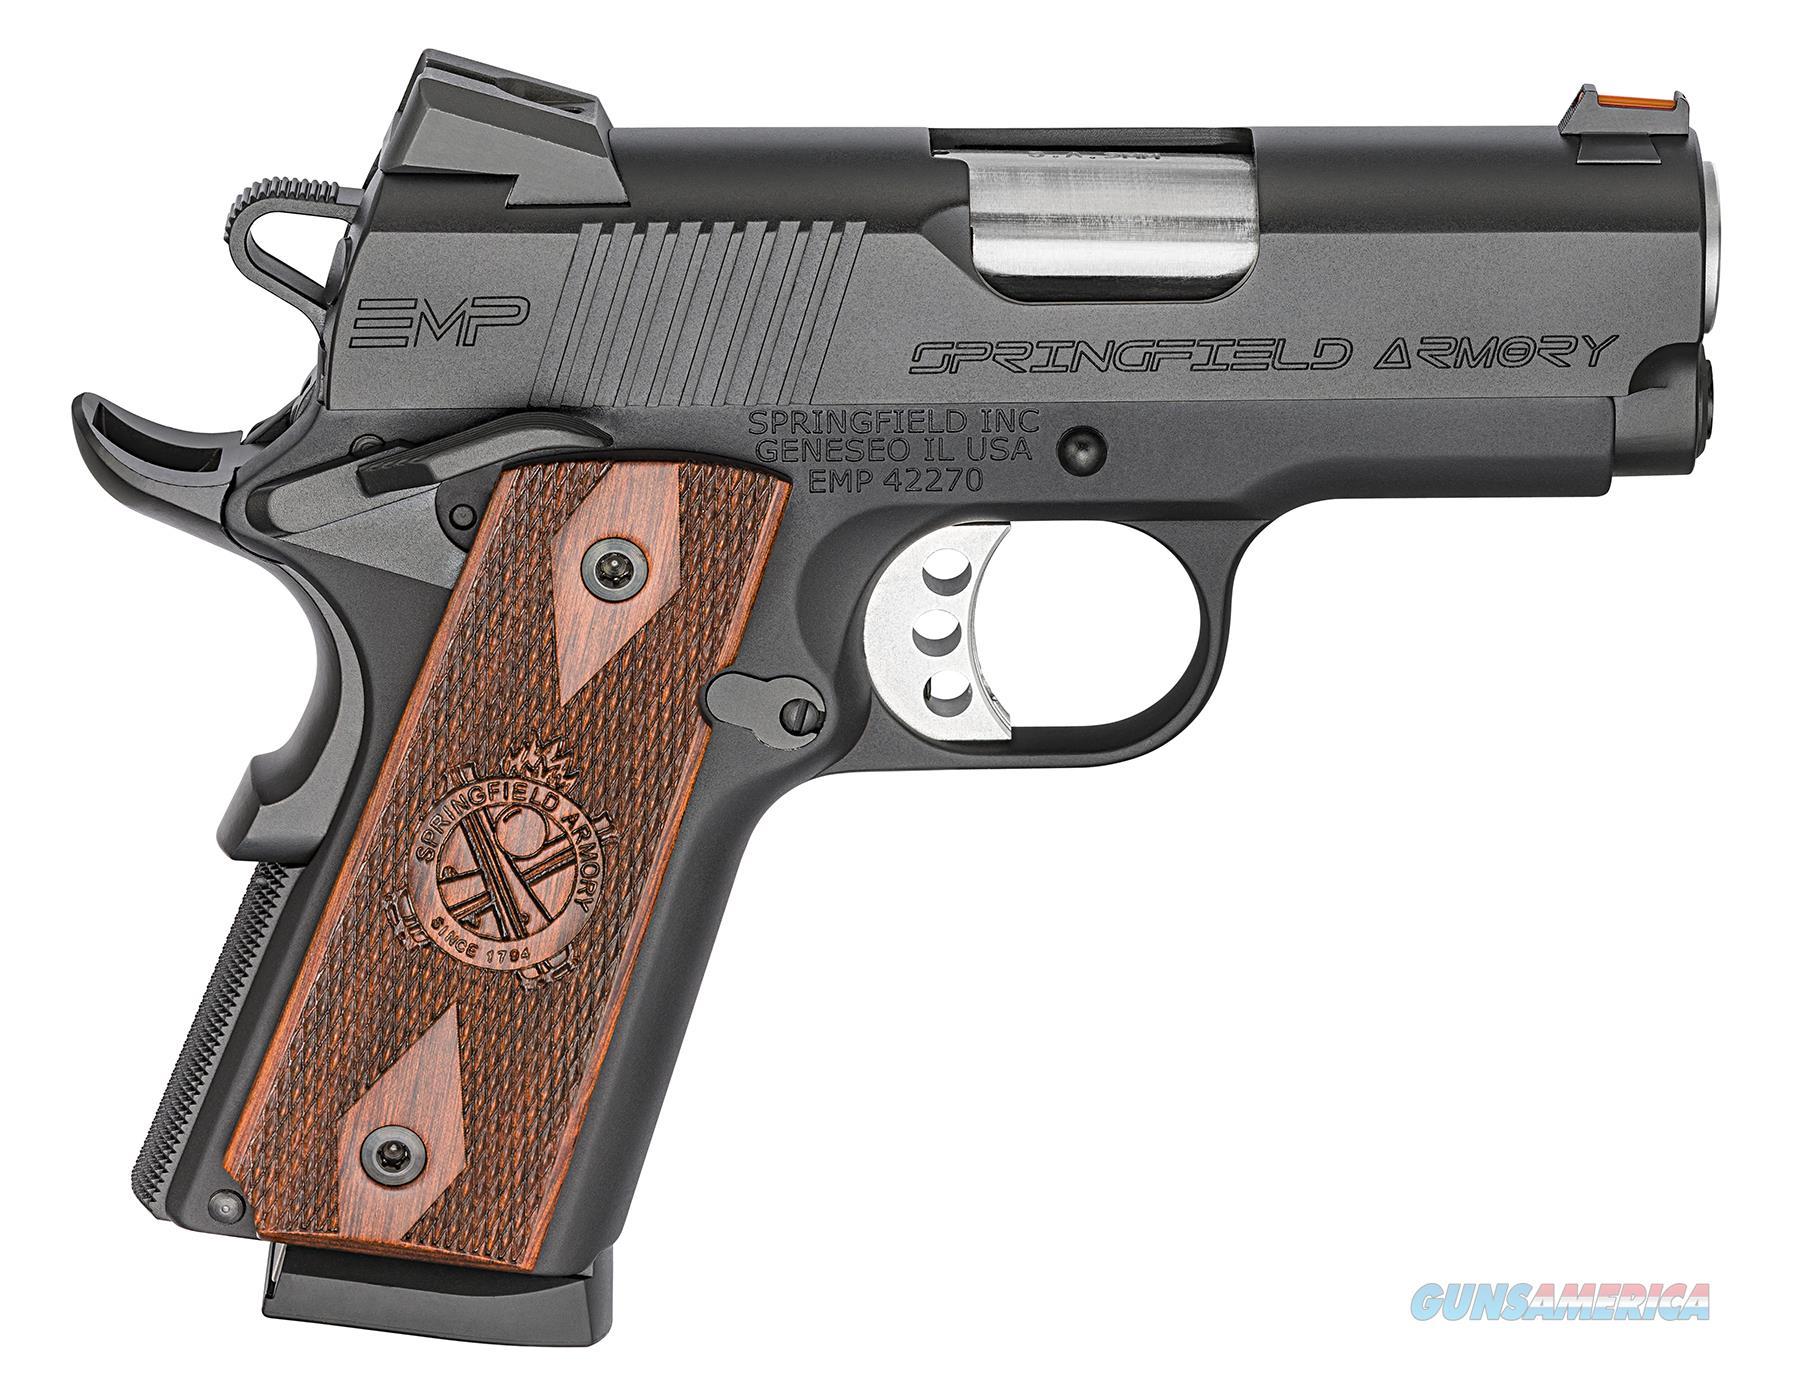 Springfield EMP 9mm Black Compact 1911 w/ 3 Mags PI9208L *NEW*   Guns > Pistols > Springfield Armory Pistols > 1911 Type